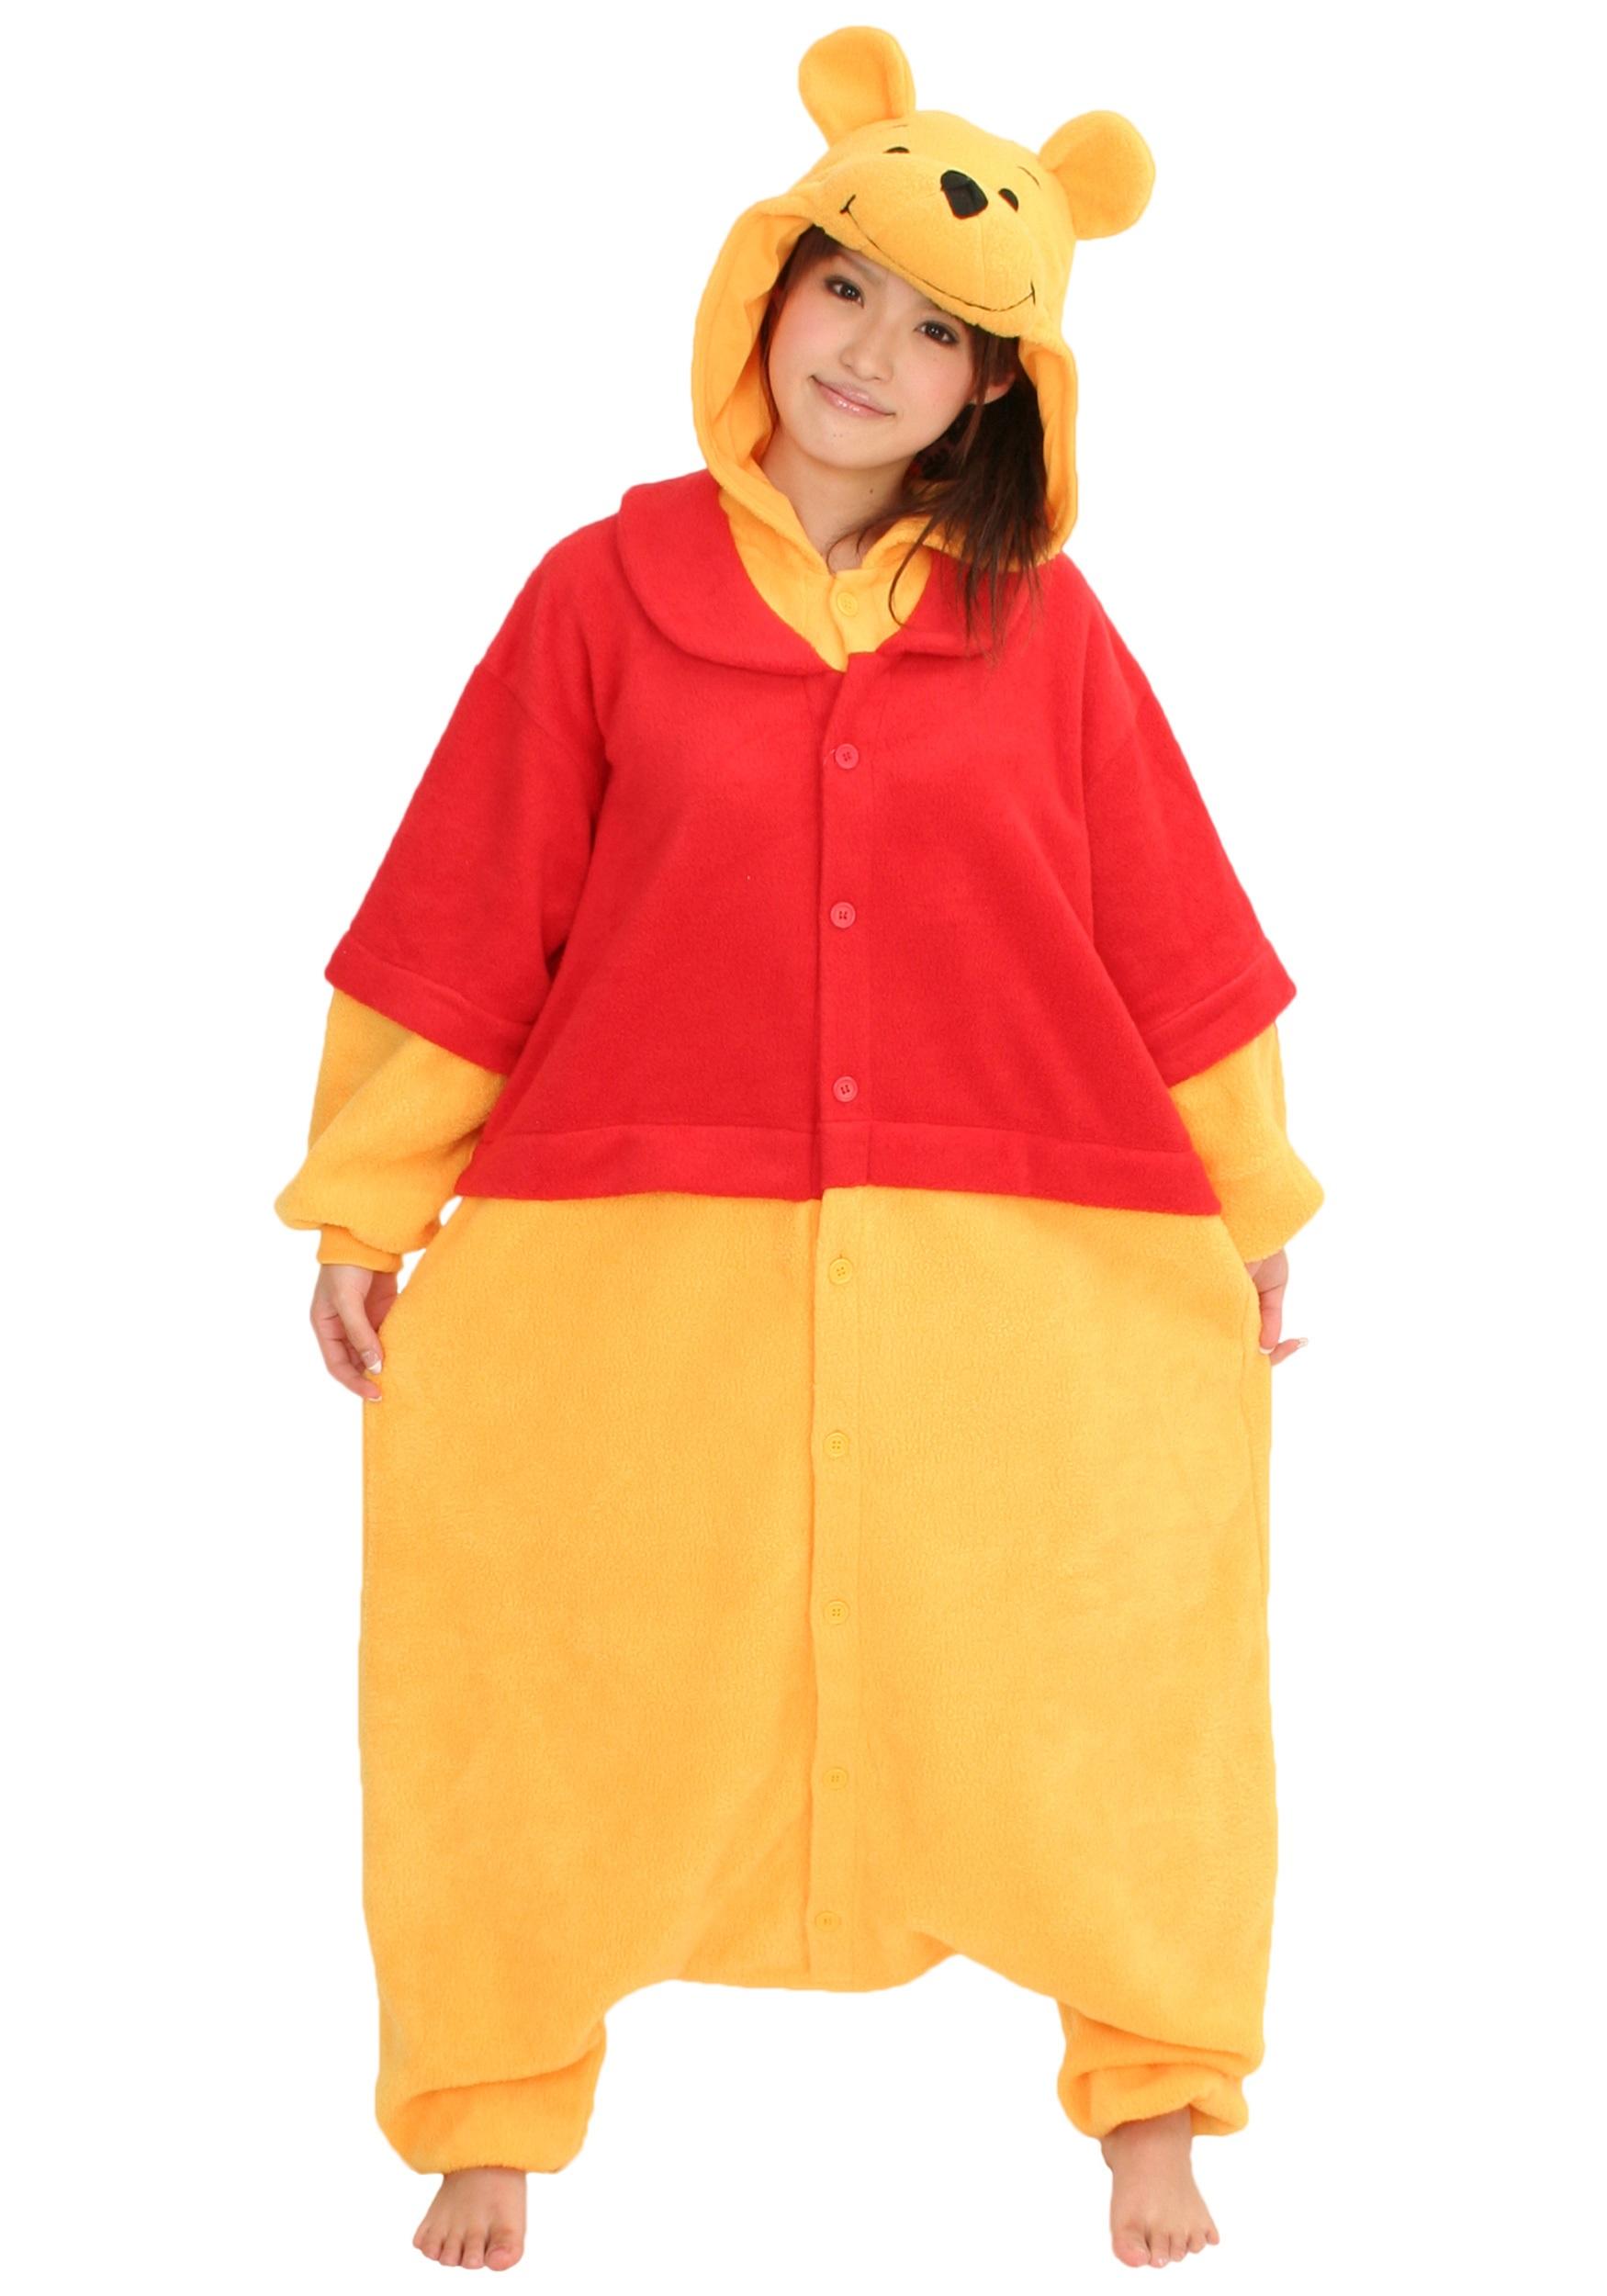 Winnie the Pooh Pooh Bear Kigurumi Pajamas for Adults